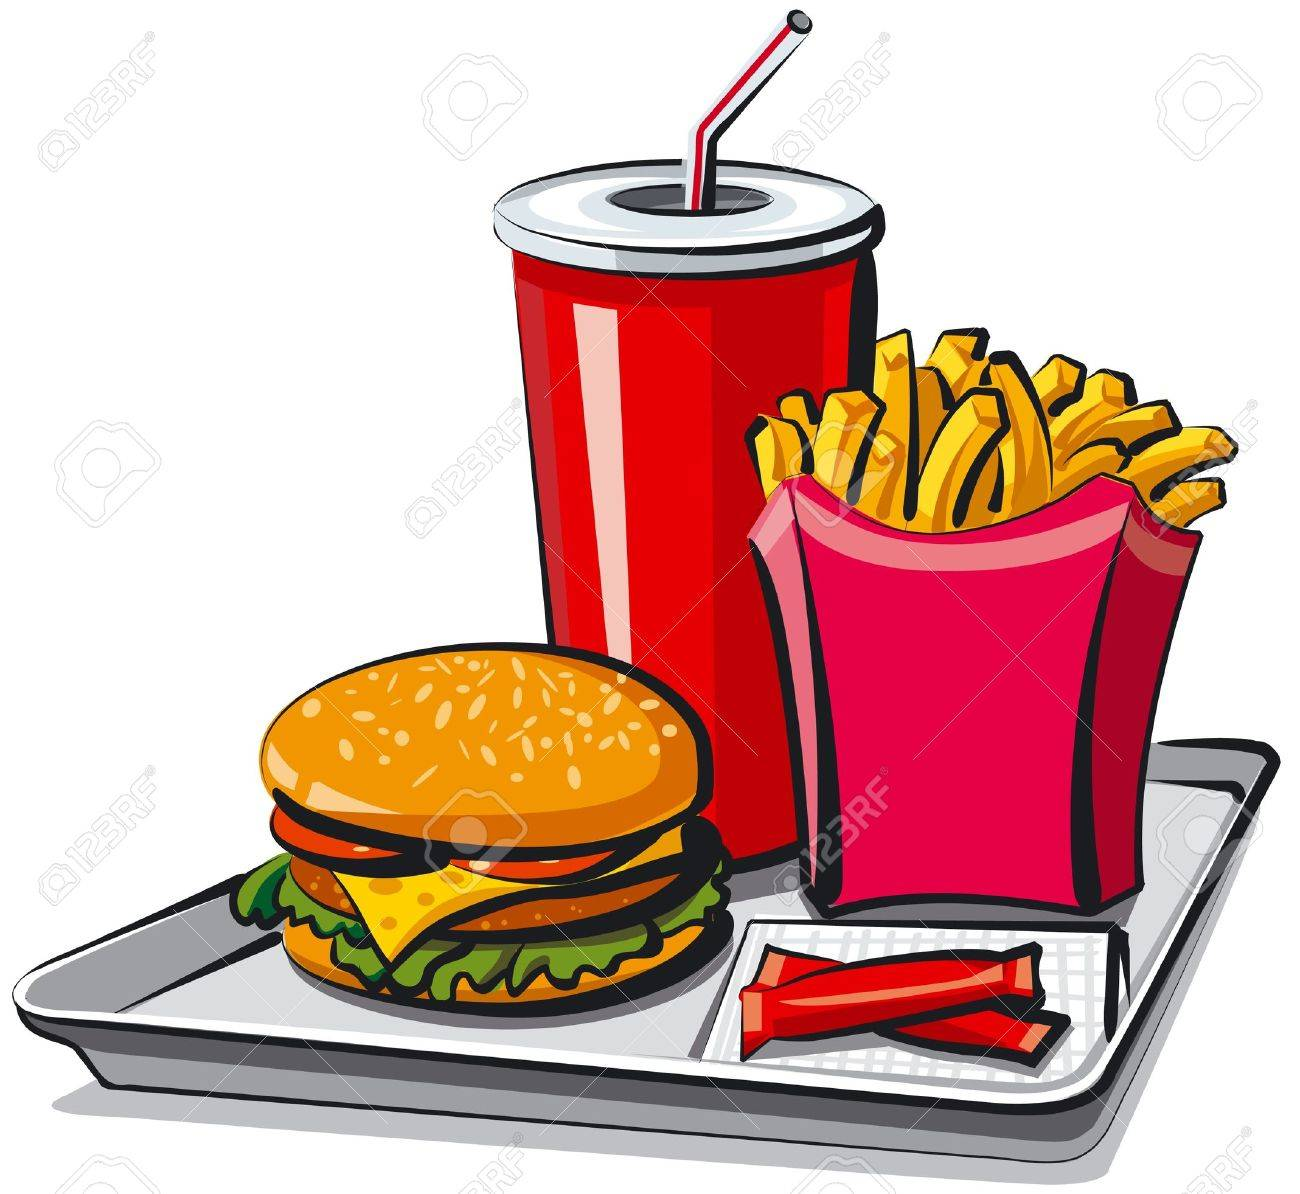 Fast-Food-Clipart Hamburger Clipart Pommes frites Pizza | Etsy